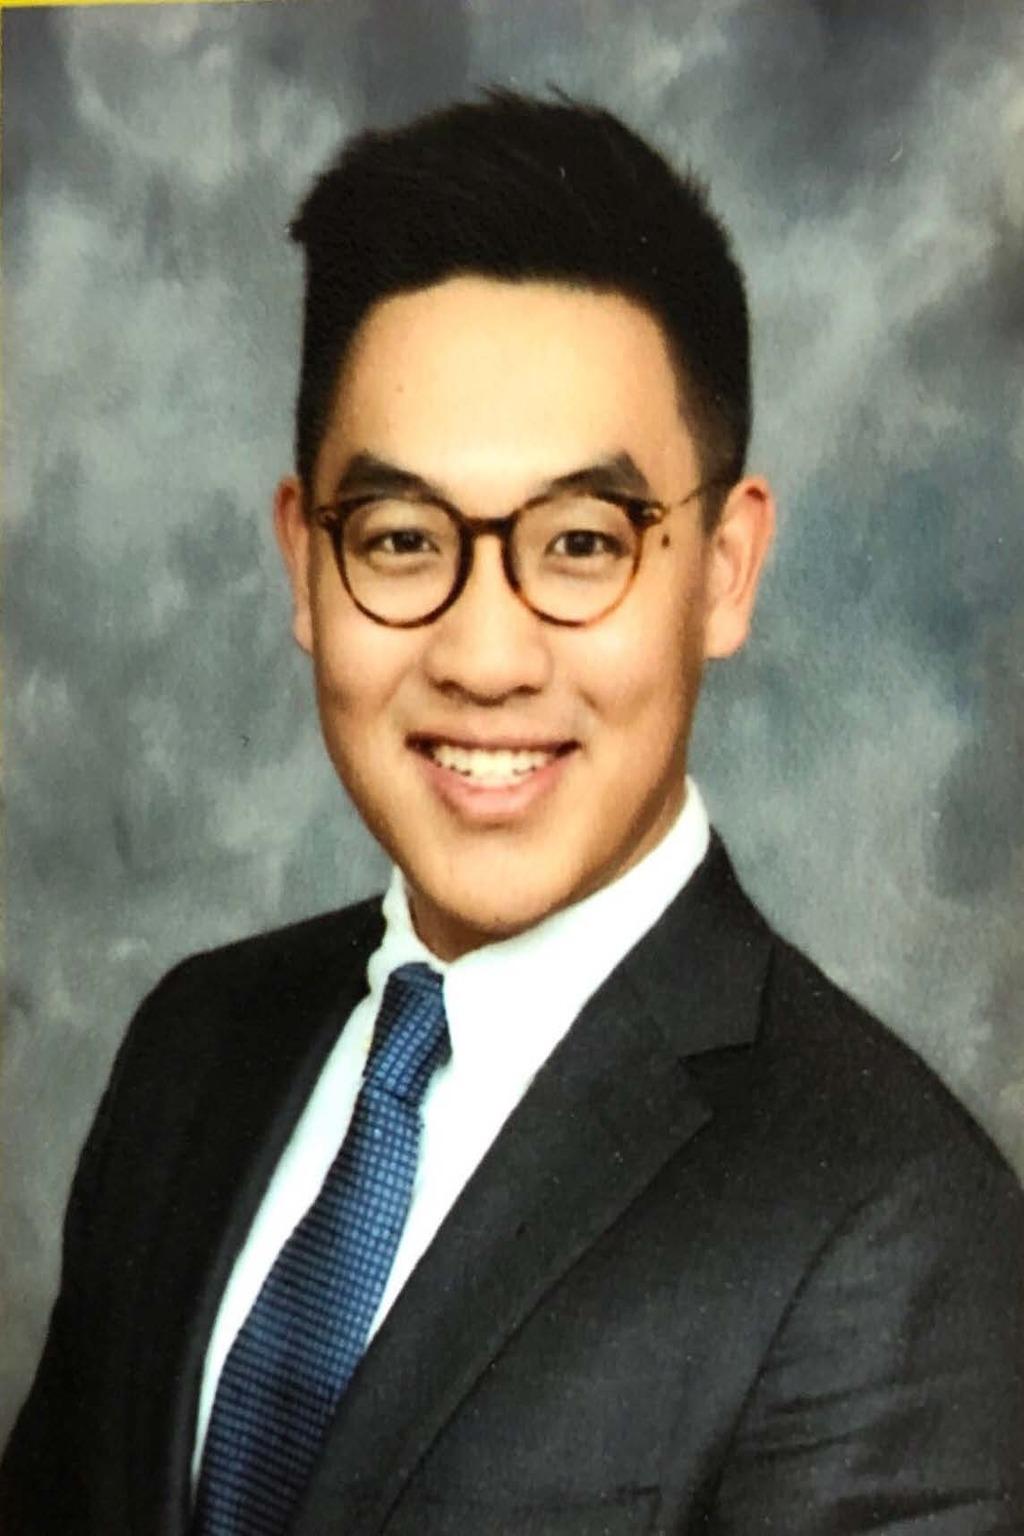 Bradley Wong